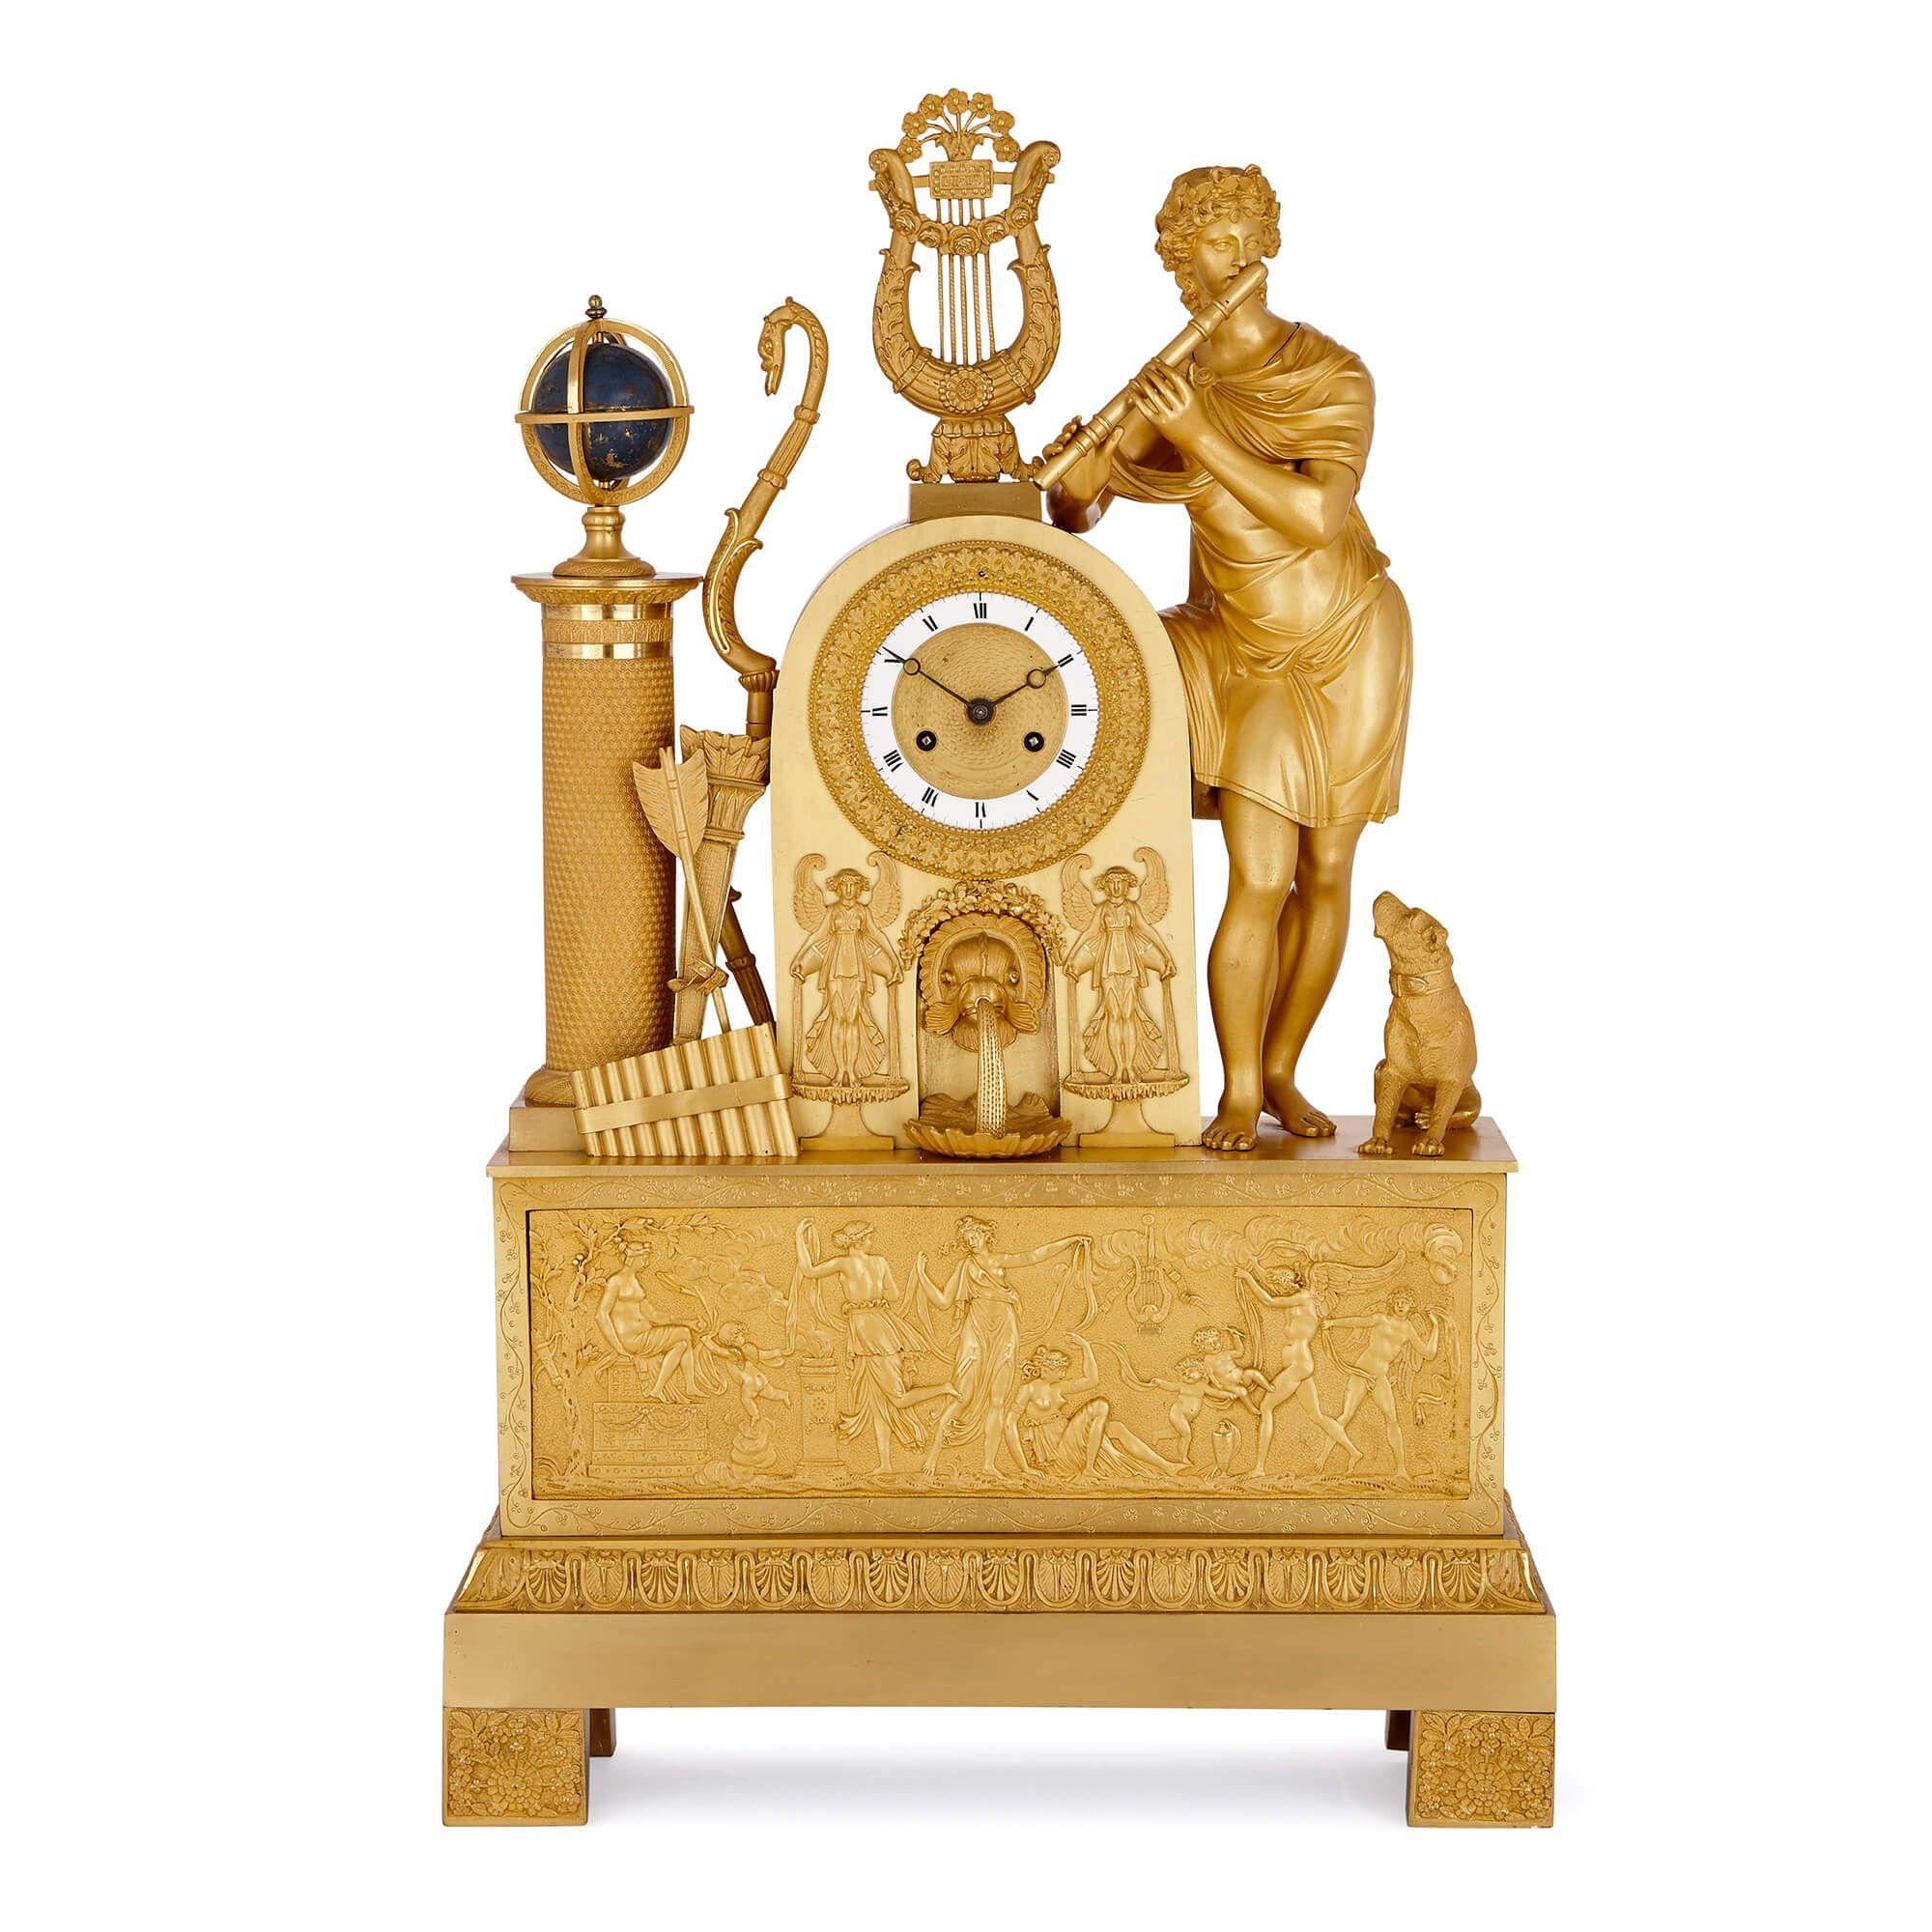 Large antique French Empire period ormolu mantel clock